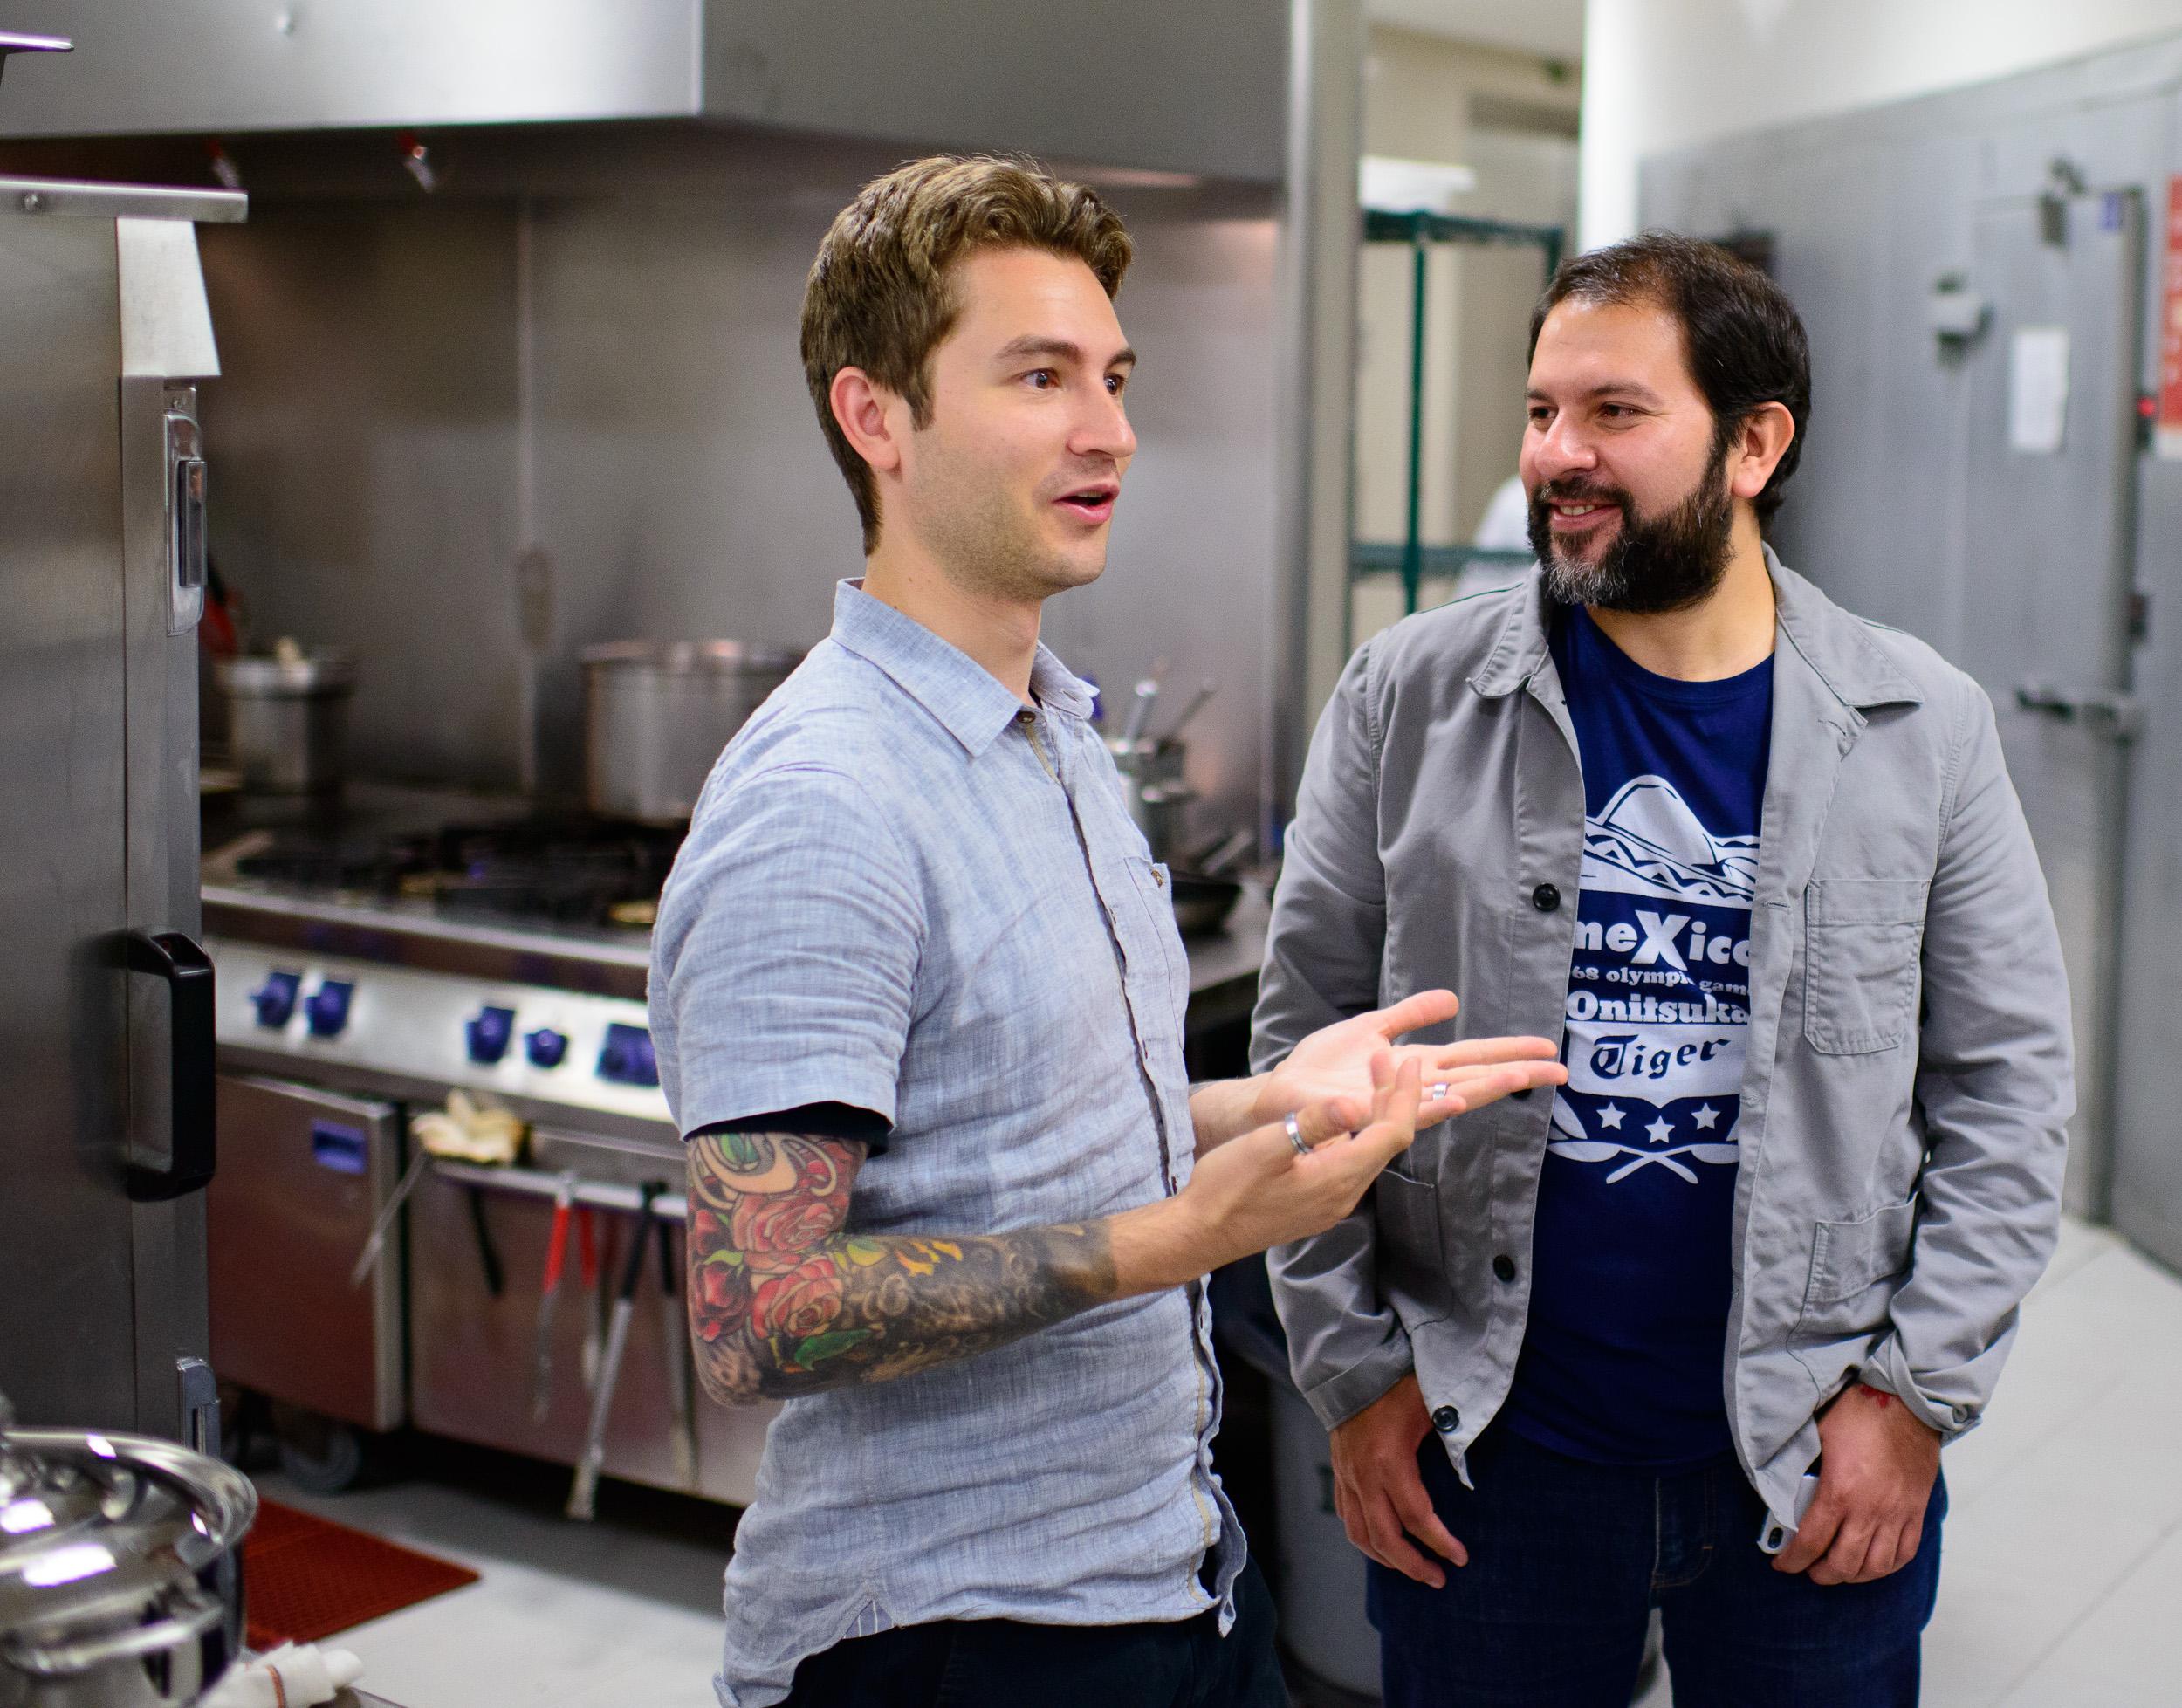 Chefs Alex Stupak and Enrique Olvera